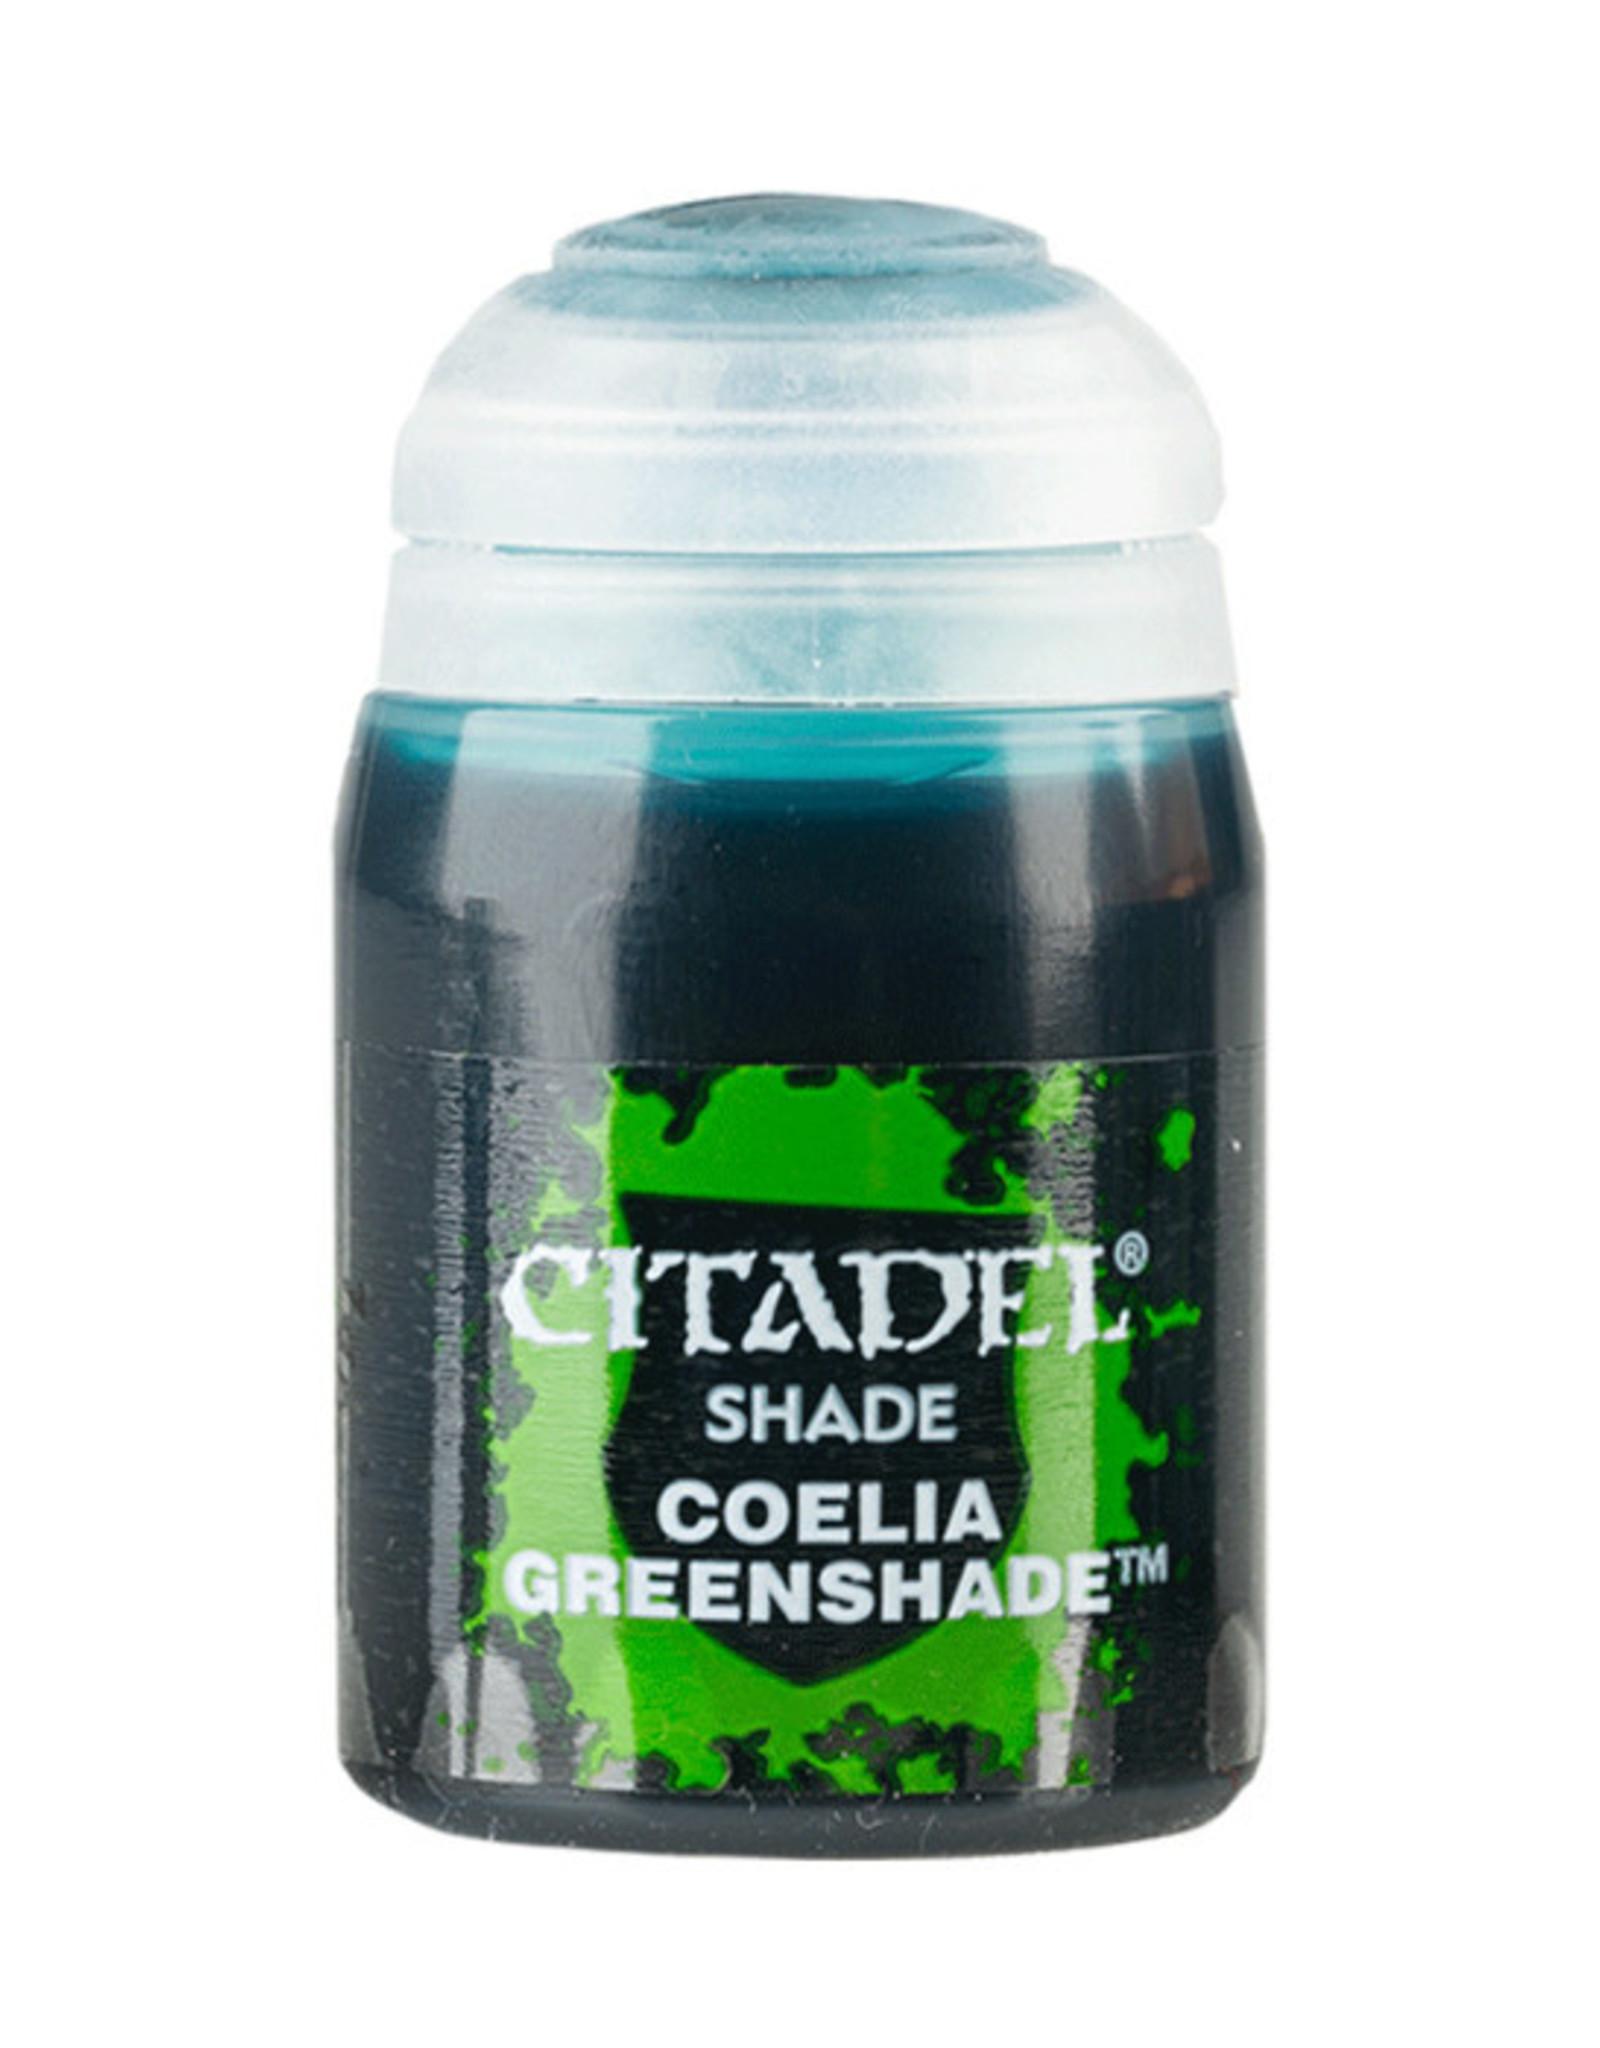 Citadel Citadel Colour: Shade - Coelia Greenshade (24ML)